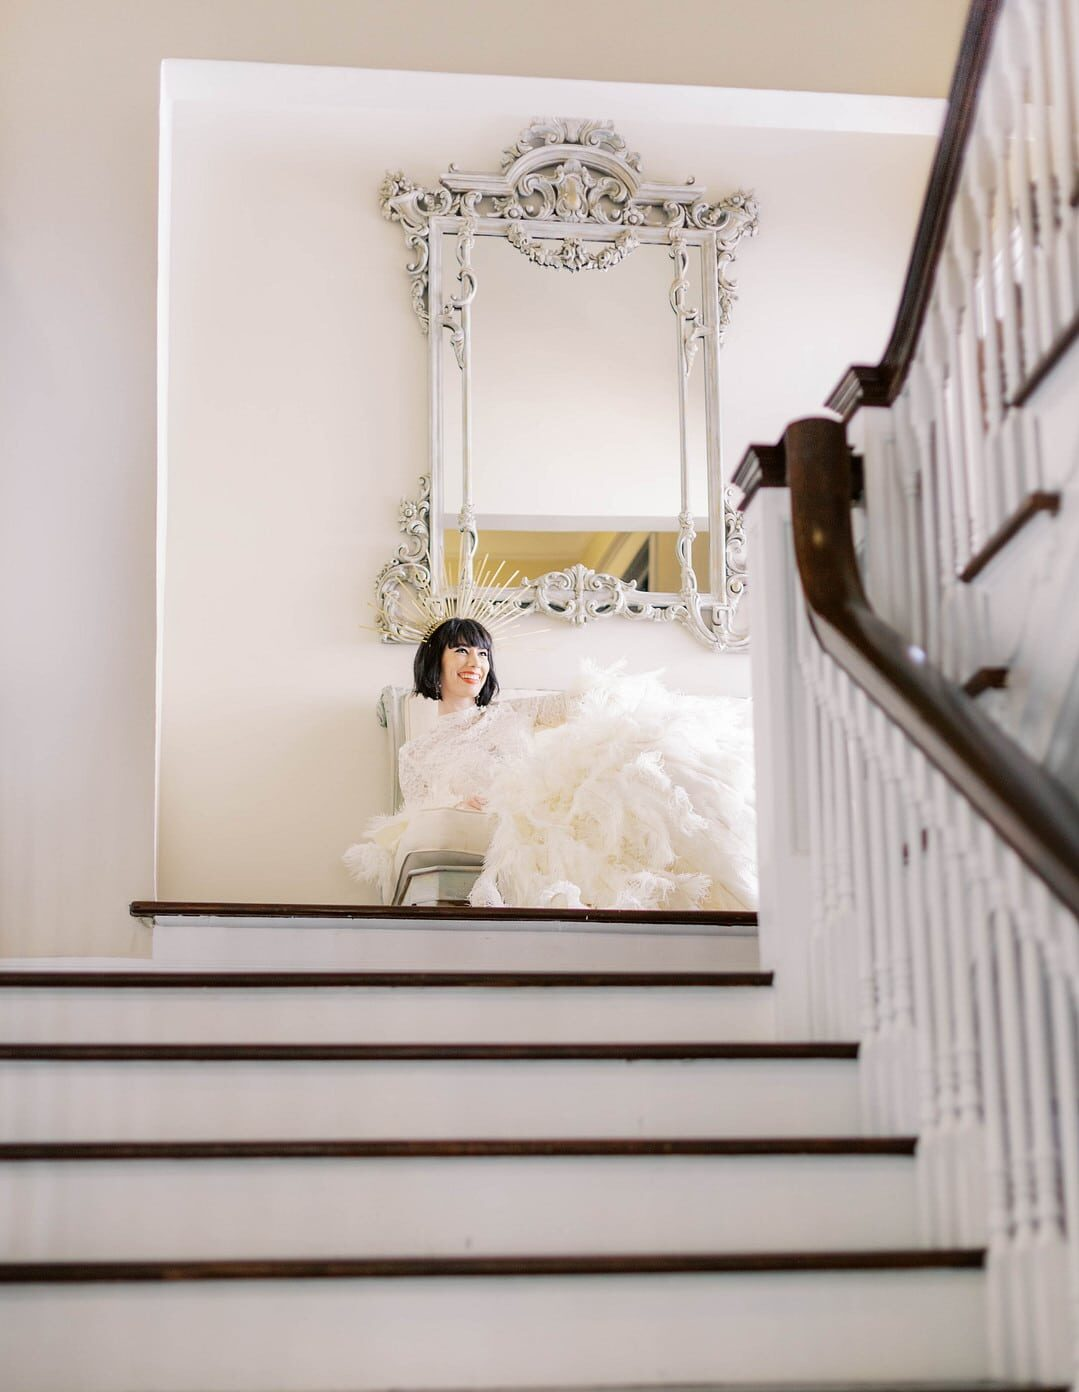 70's Inspired Wedding - Styled Shoot 13